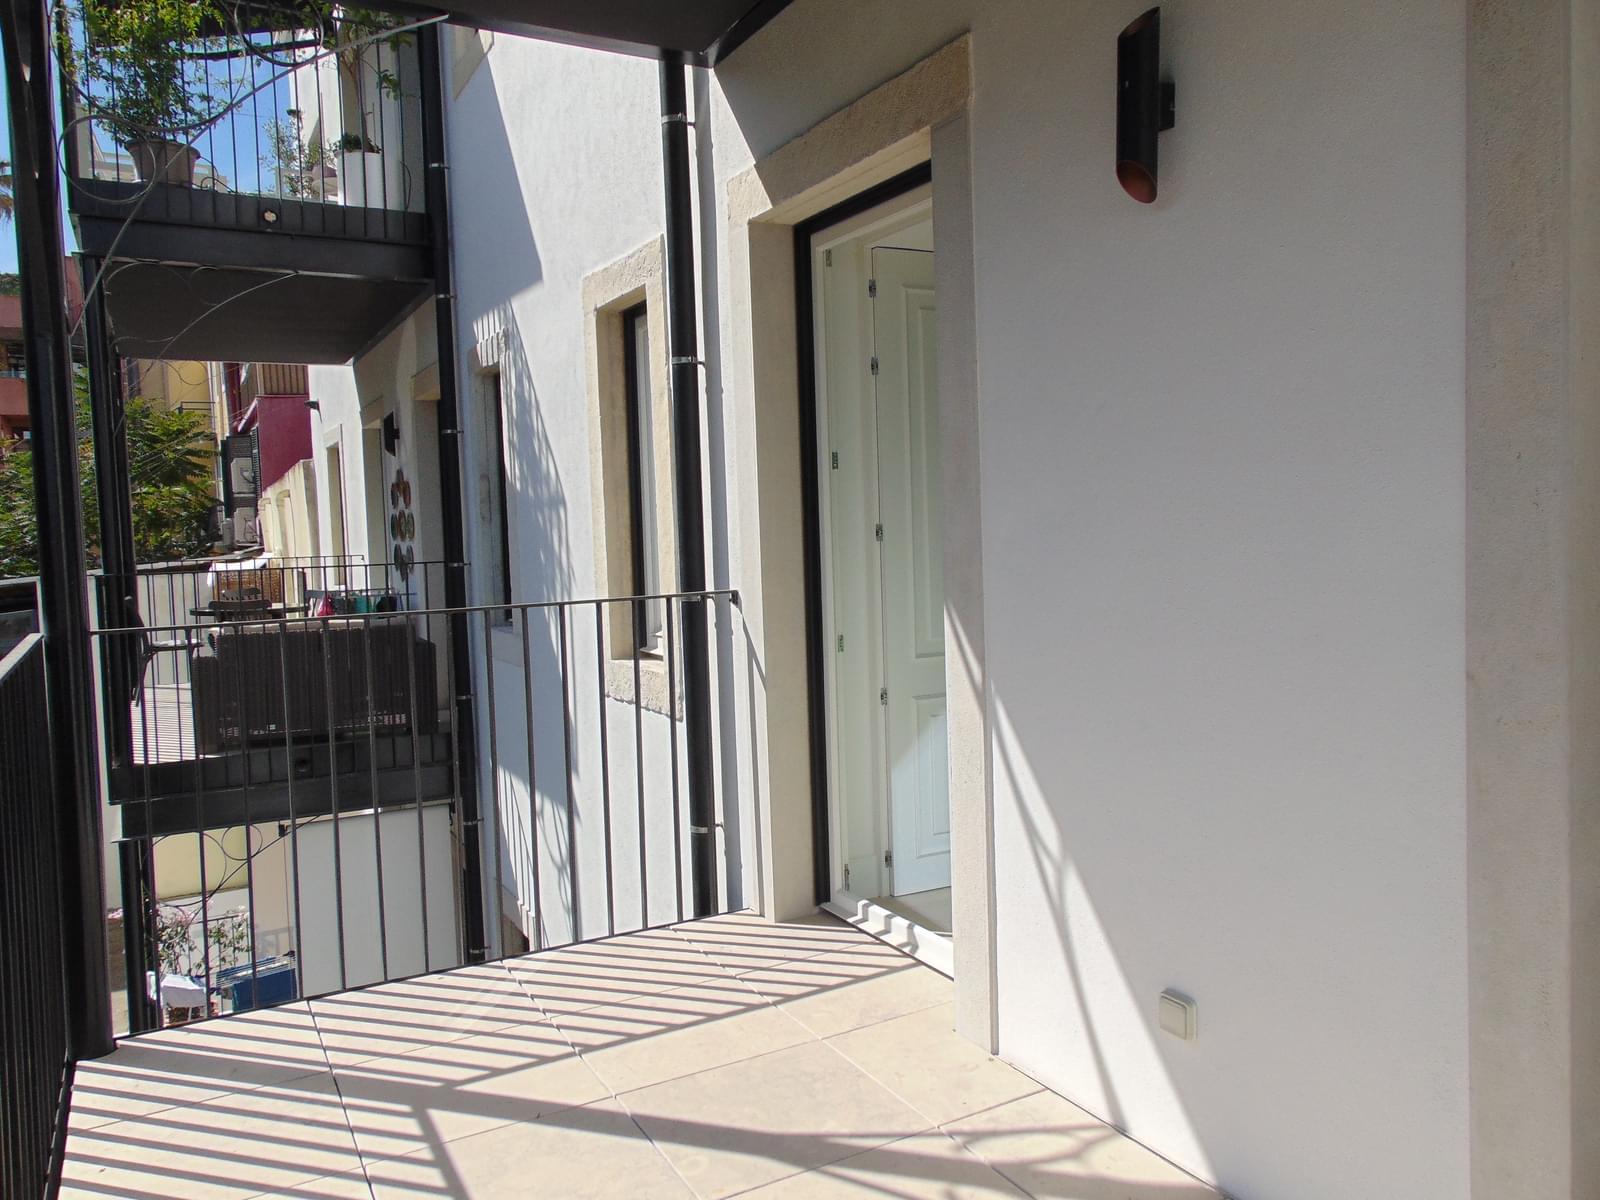 pf18152-apartamento-t2-lisboa-6bad2e77-f71f-4171-b667-b167b1afc519